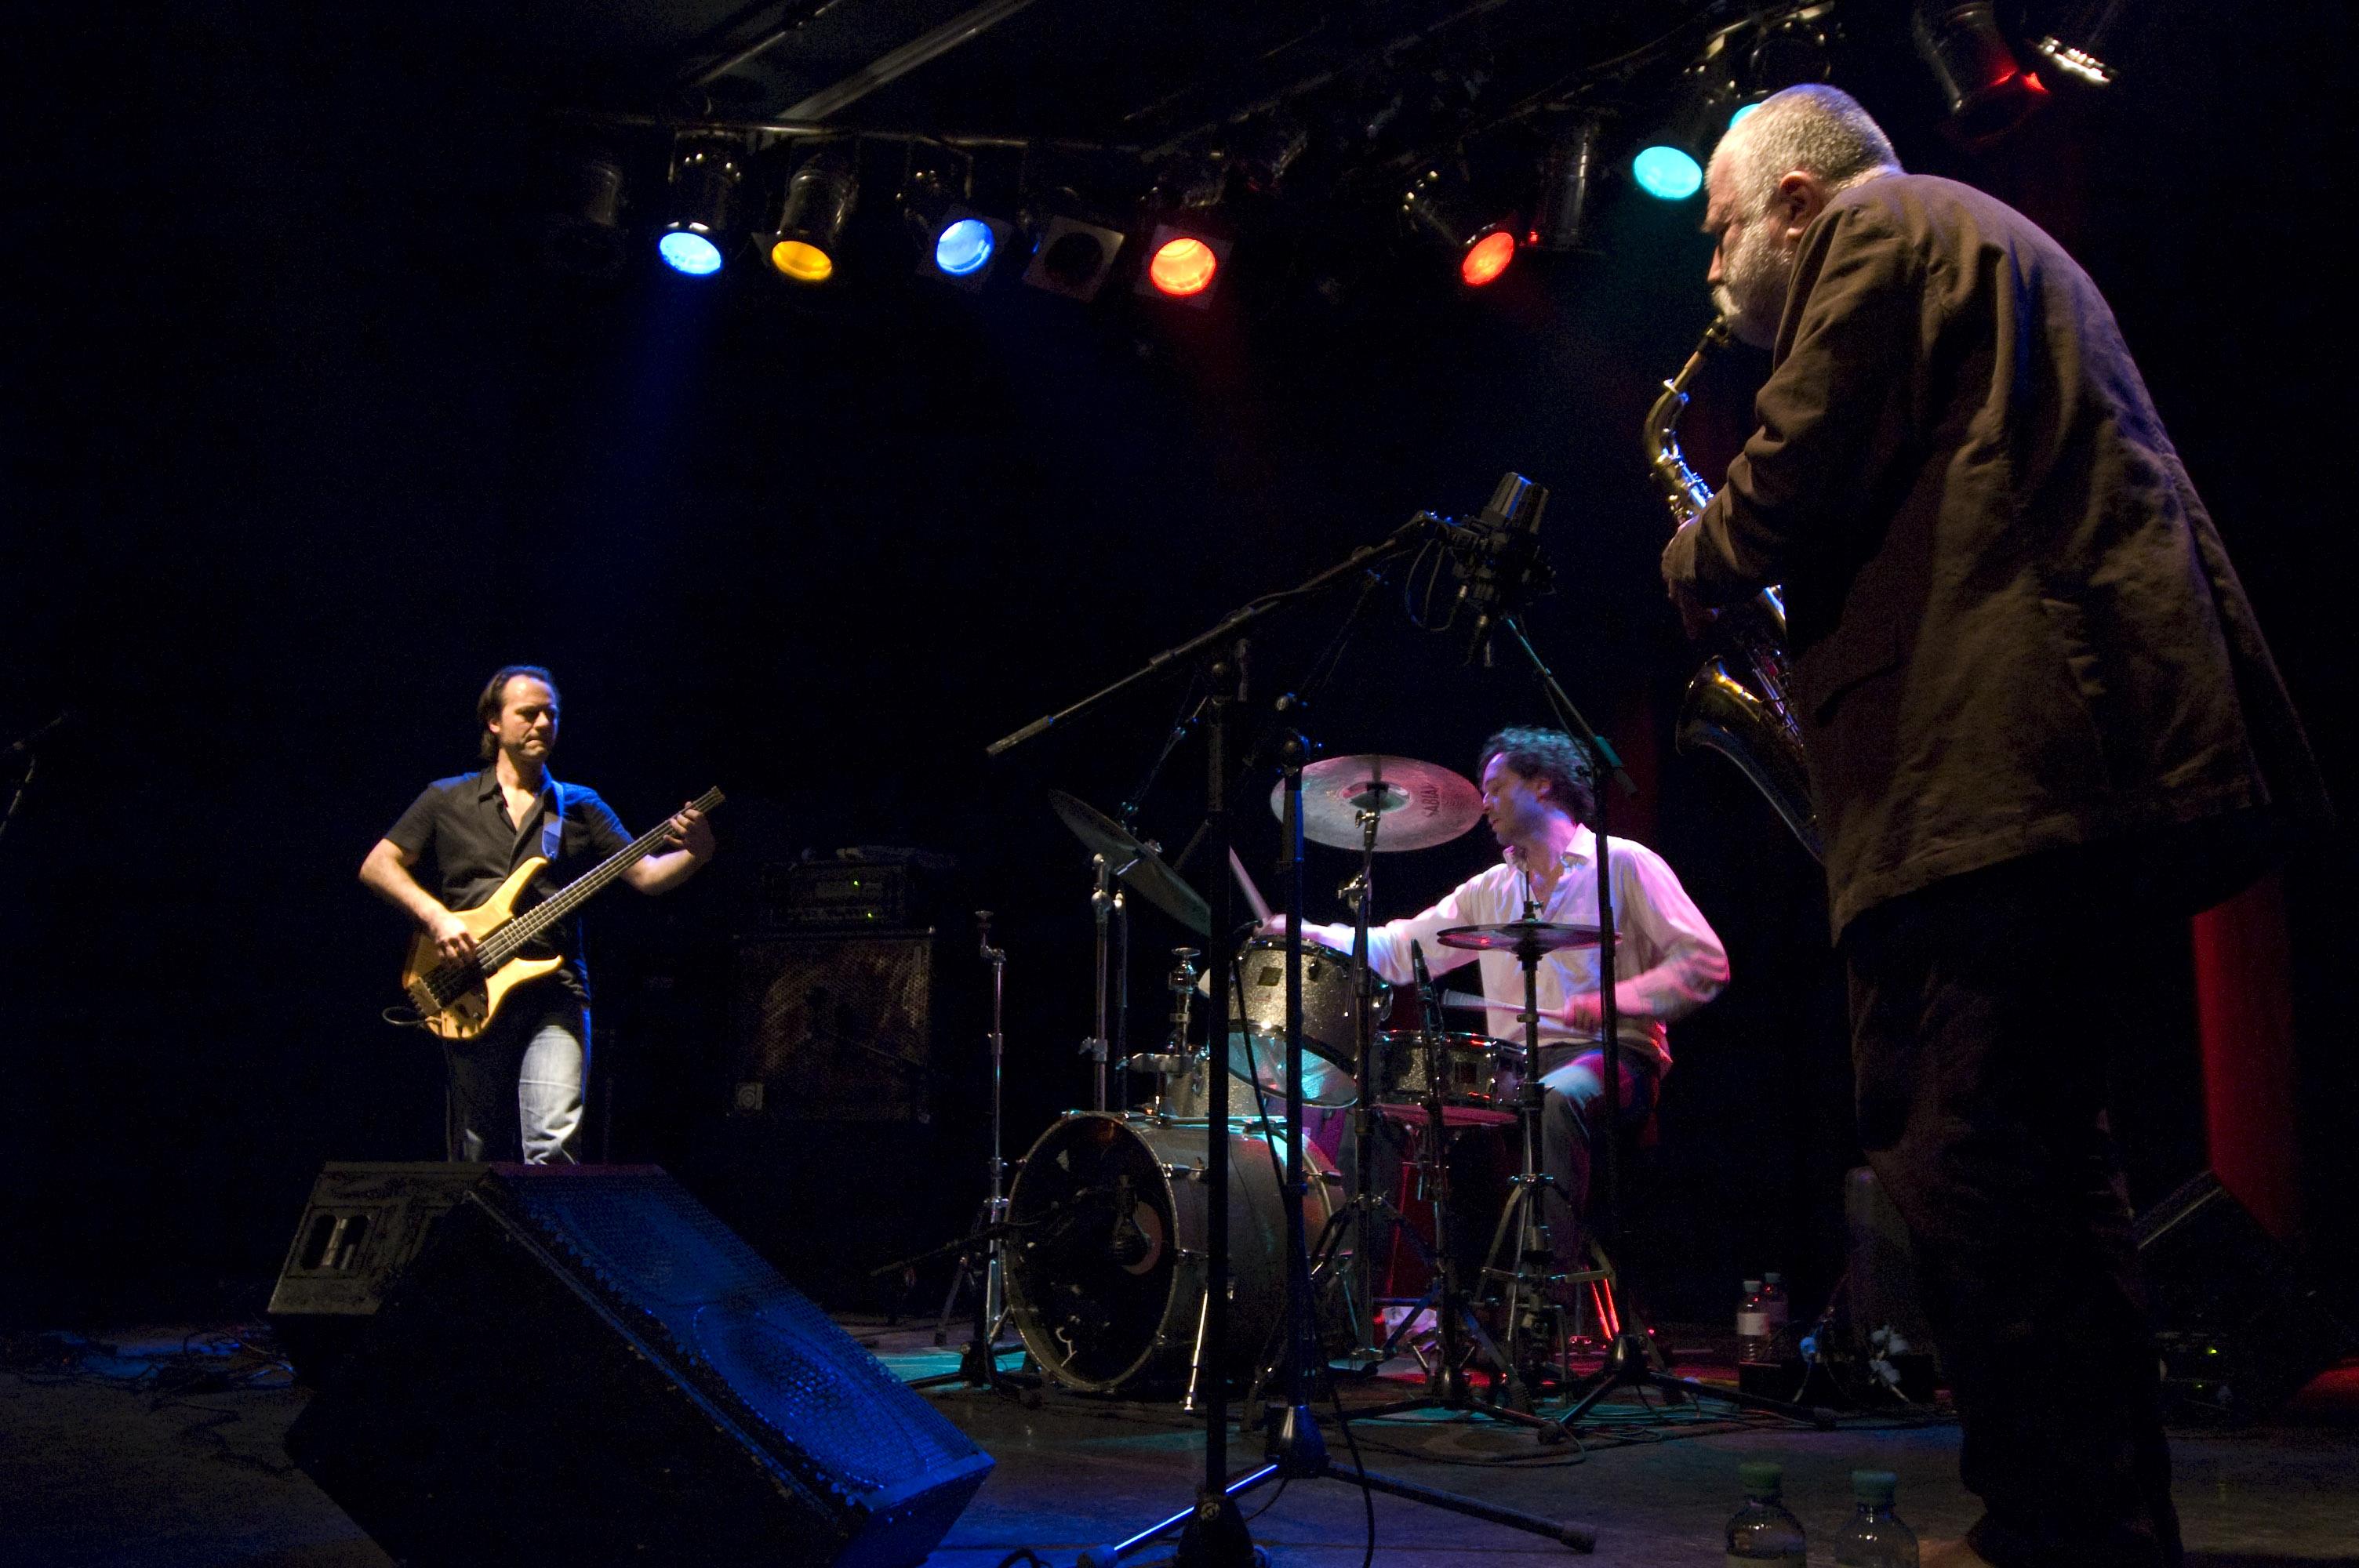 Grupo Full Blast: Peter Broetzmann (sax) , Michael Wertmueller (nateria) e Marino Pliakas (baixo) (Foto: Hannes Reisinger)